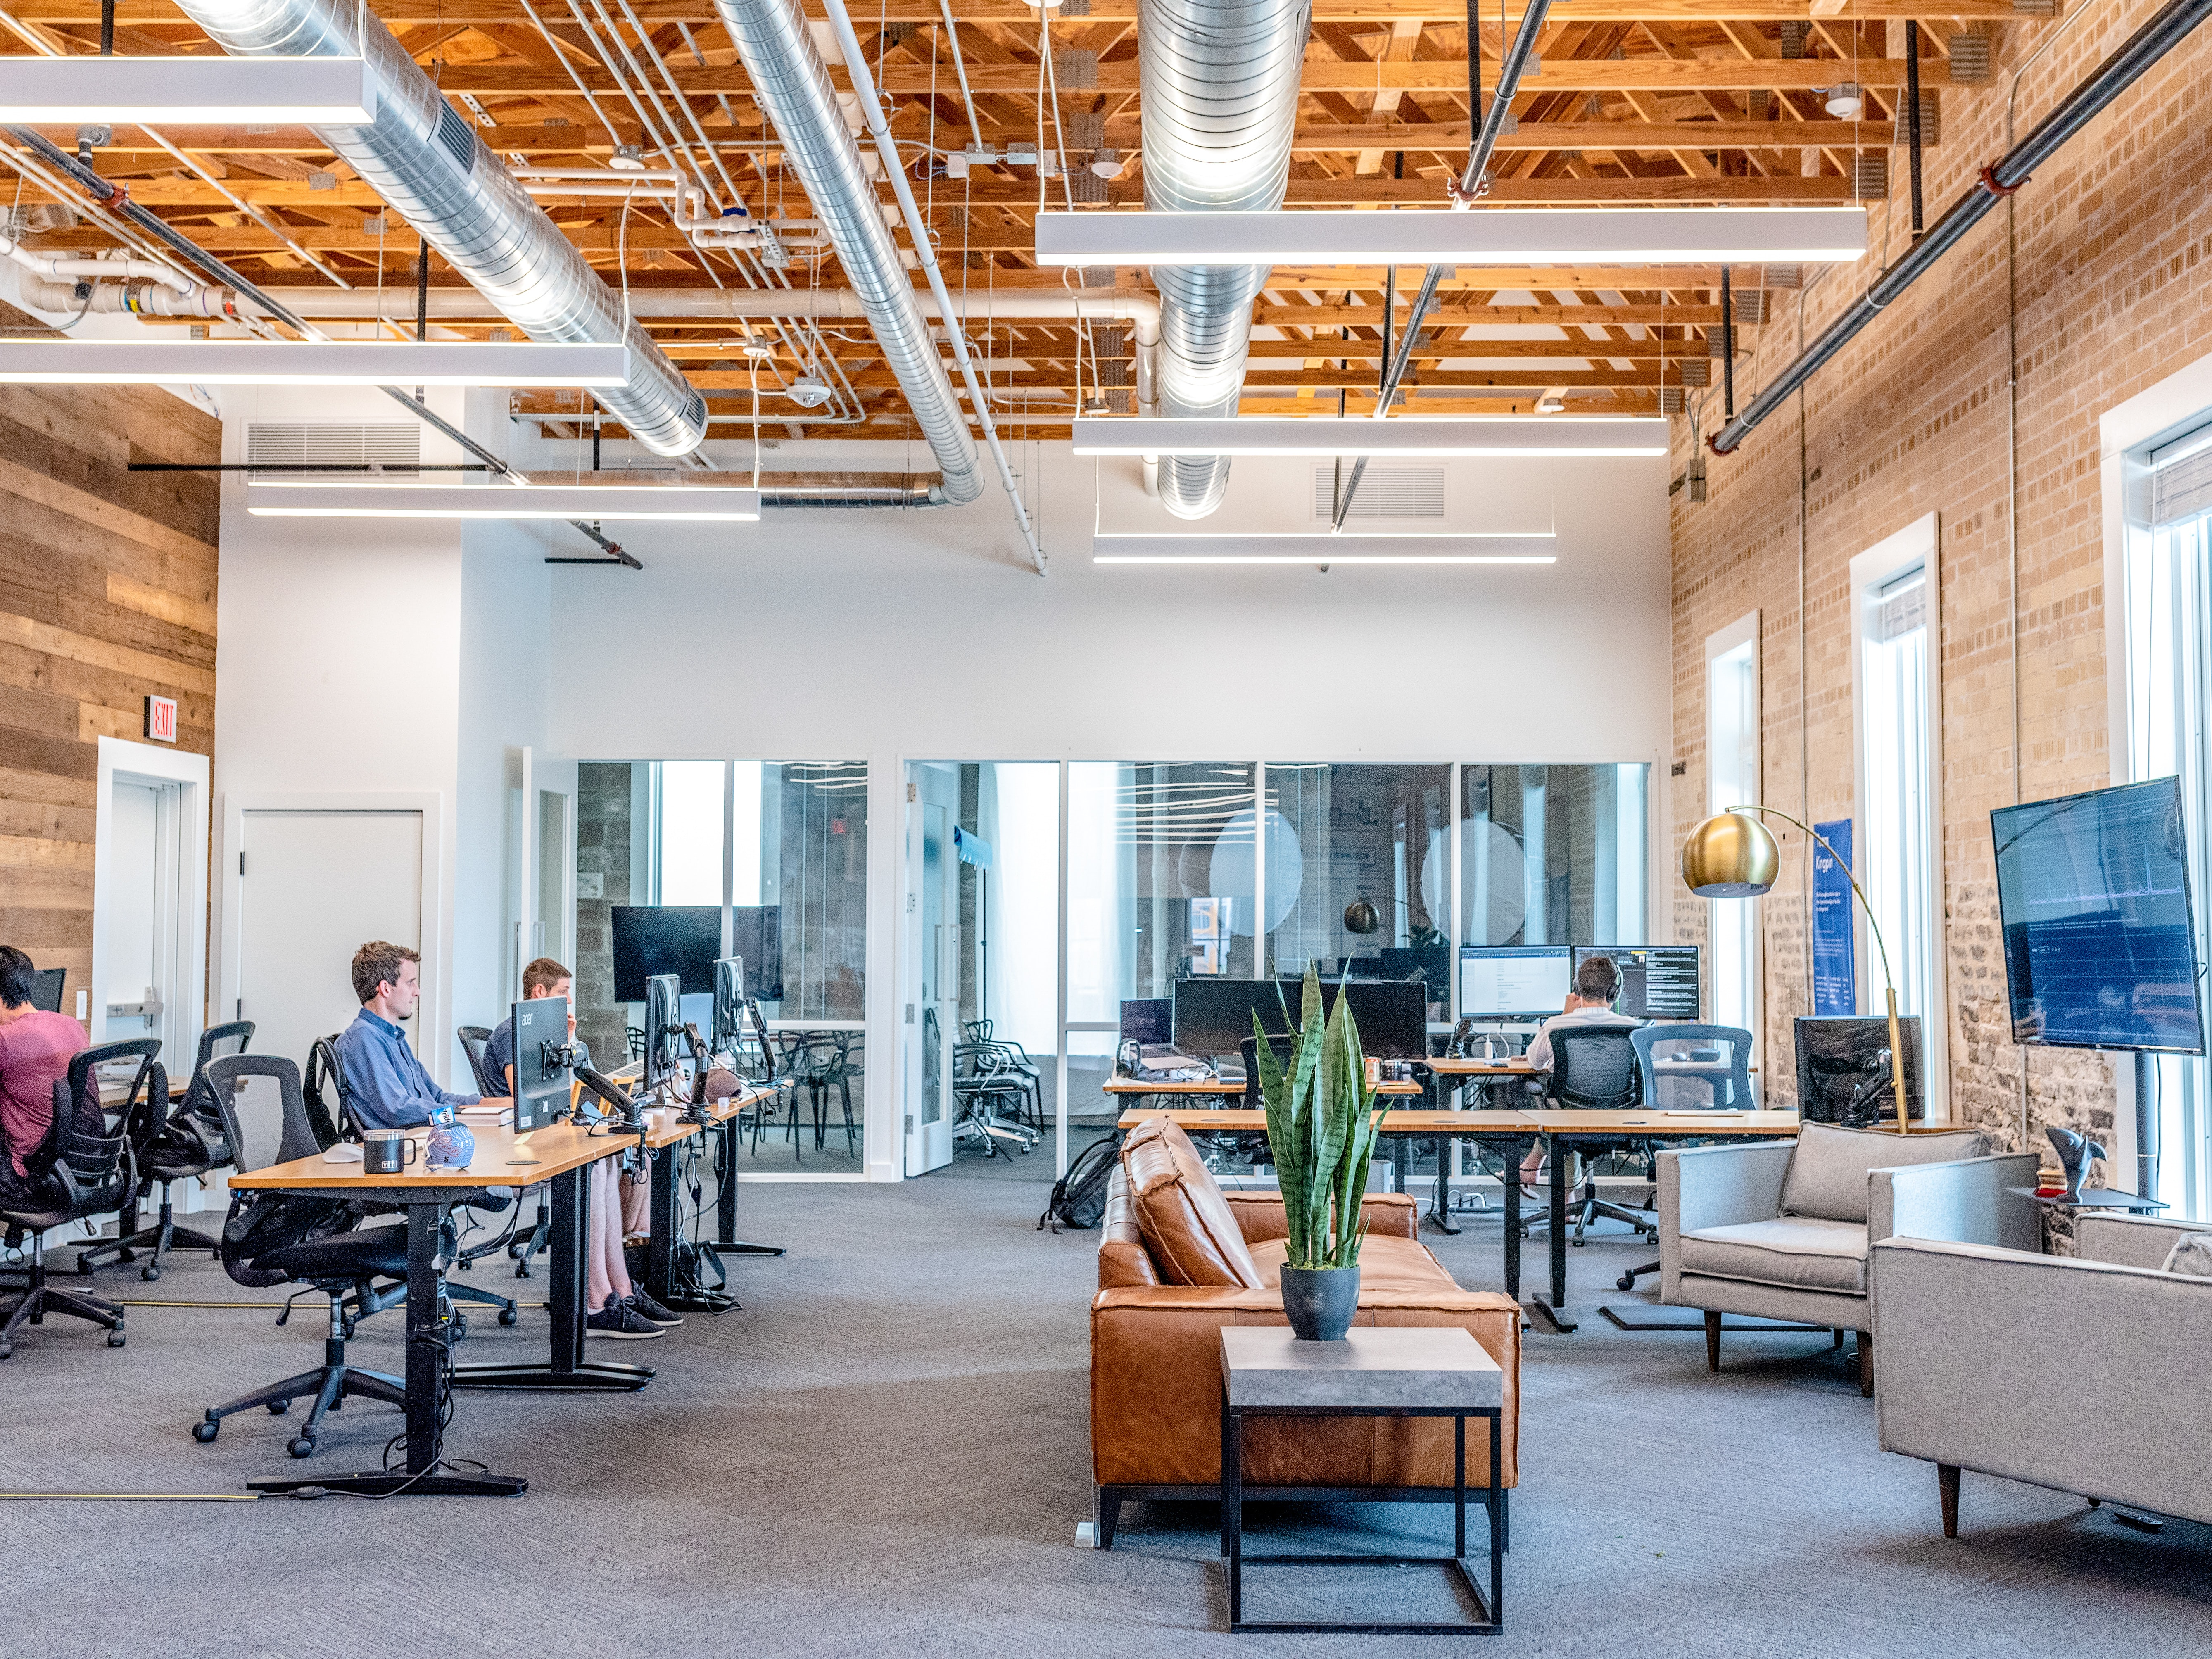 austin-distel-open-office-unsplash